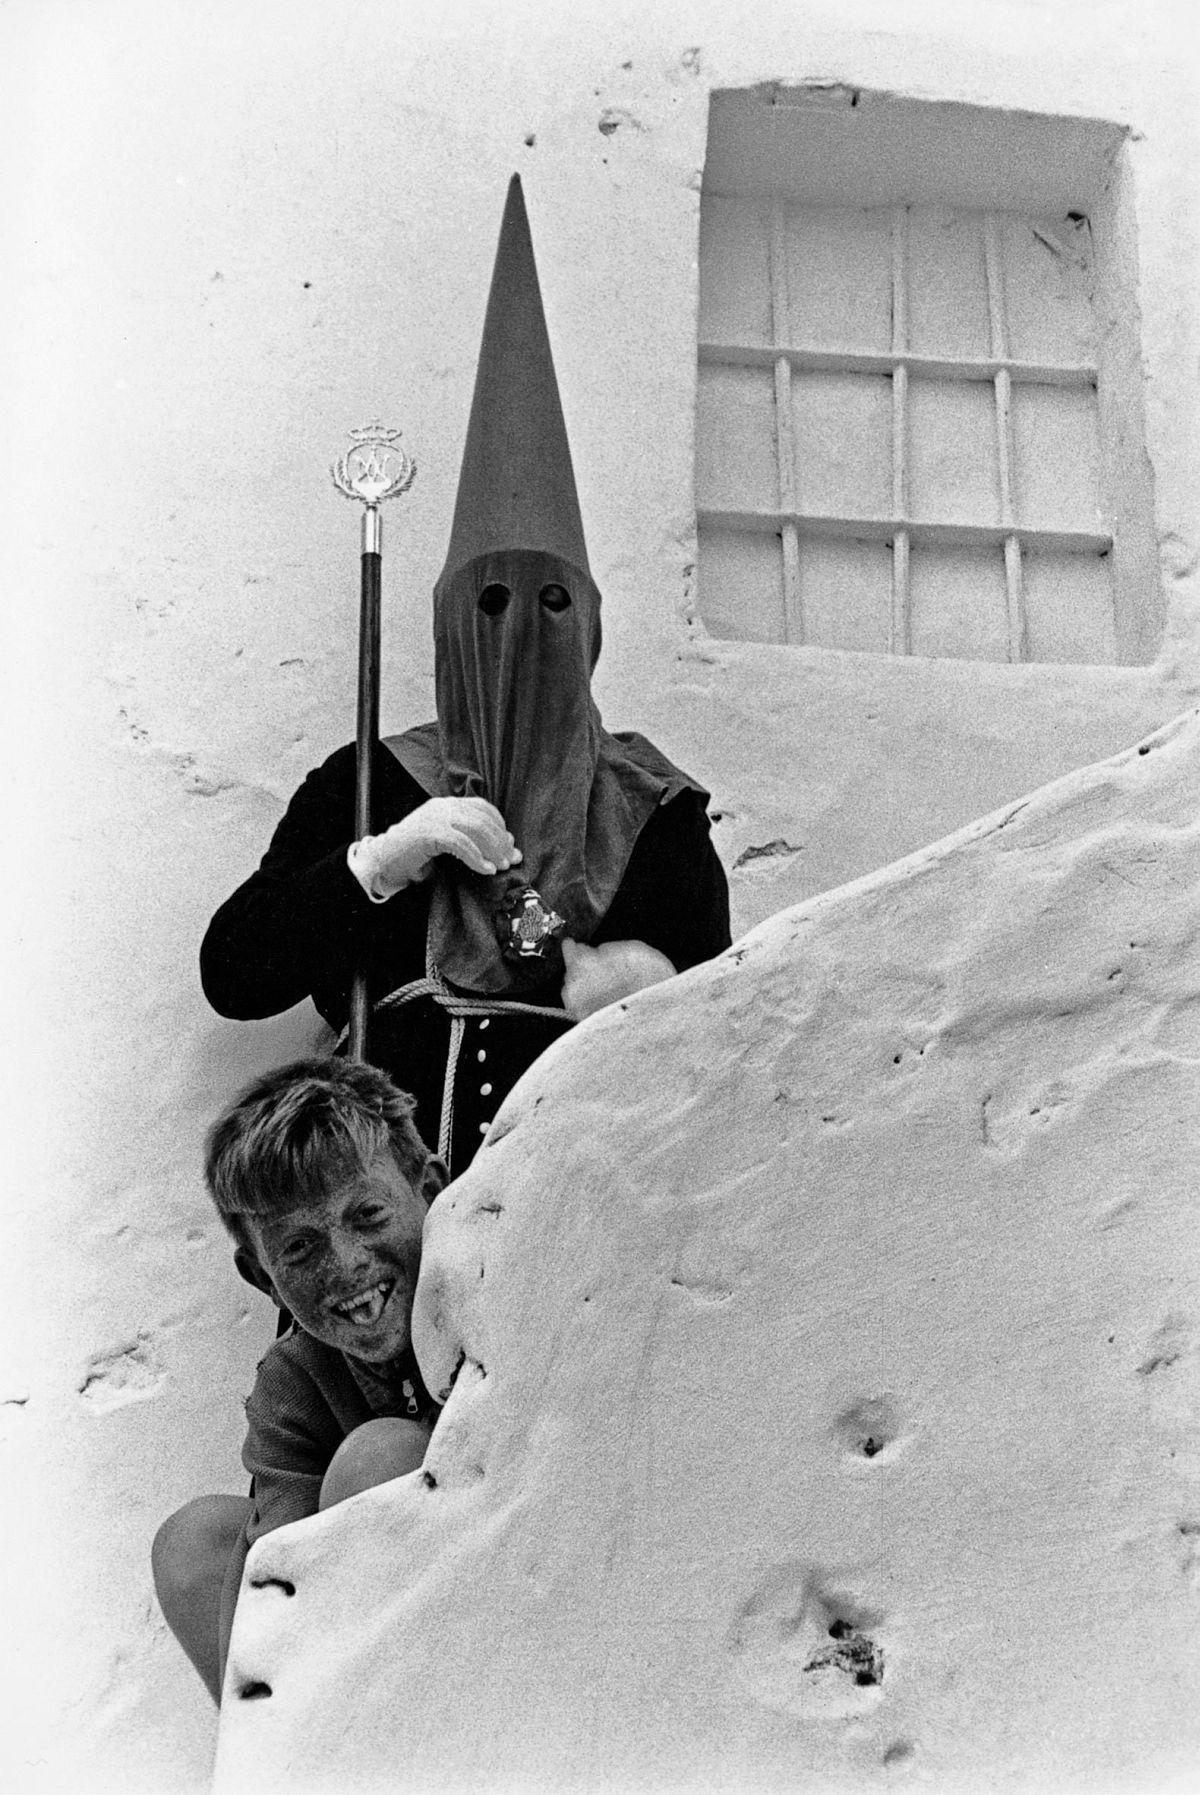 Semana Santa. Tarifa, 1961. By Xavier Miserachs. Photograph © Arena and Mar Miserachs, courtesy via La Fabrica